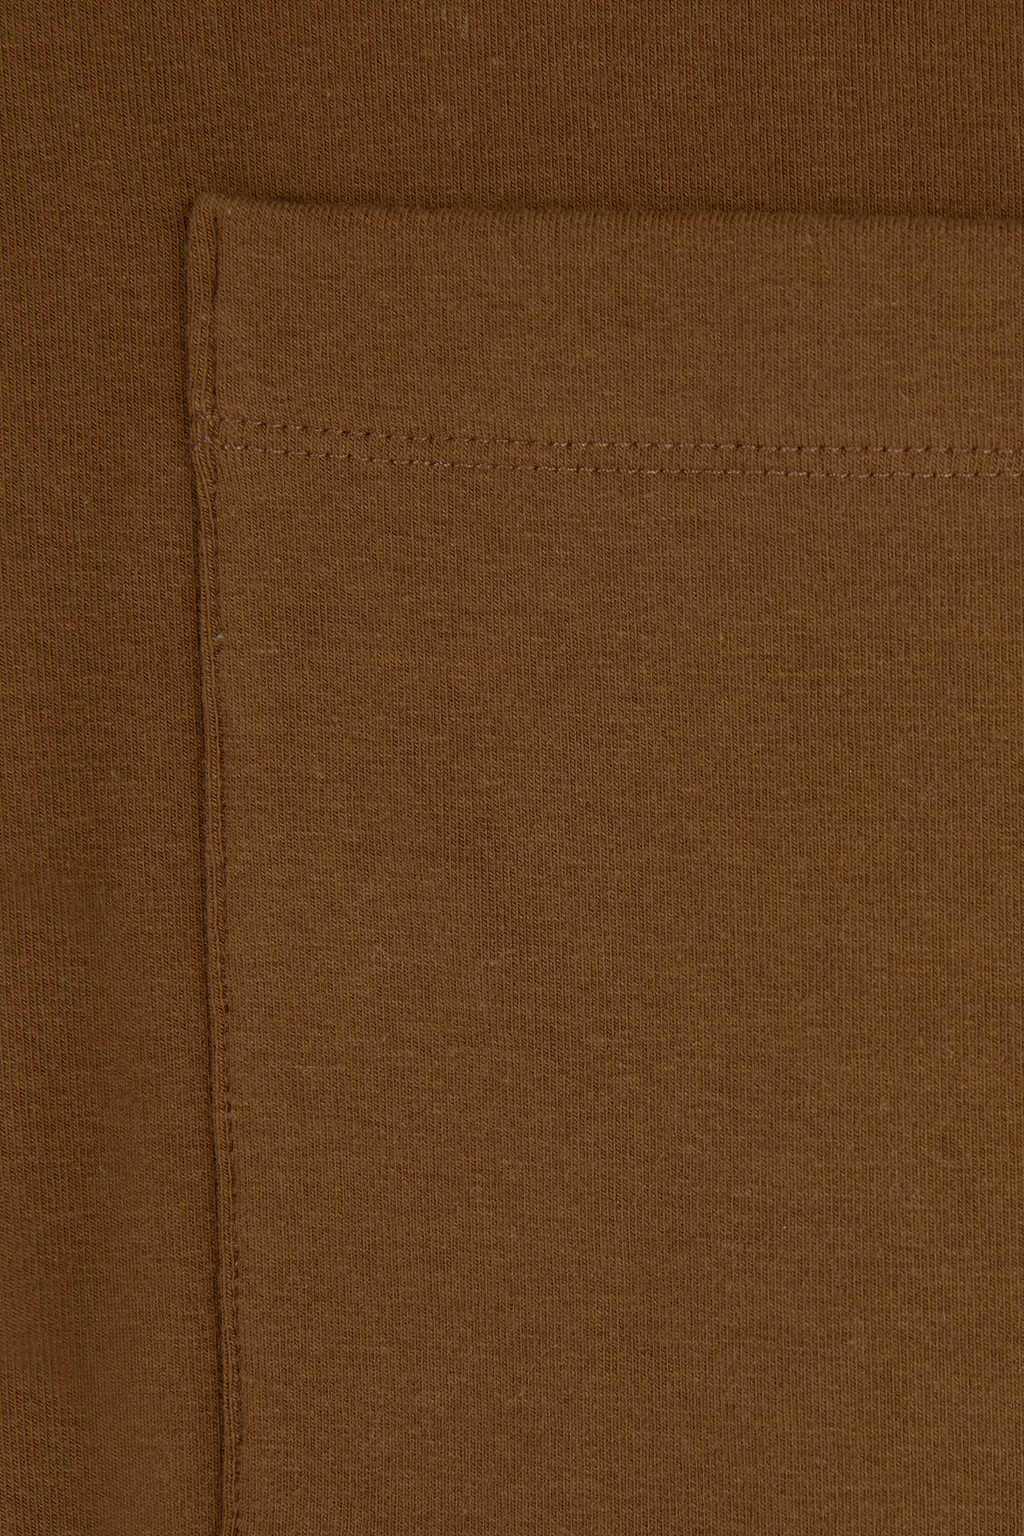 Sweatshirt 2968 Camel 7